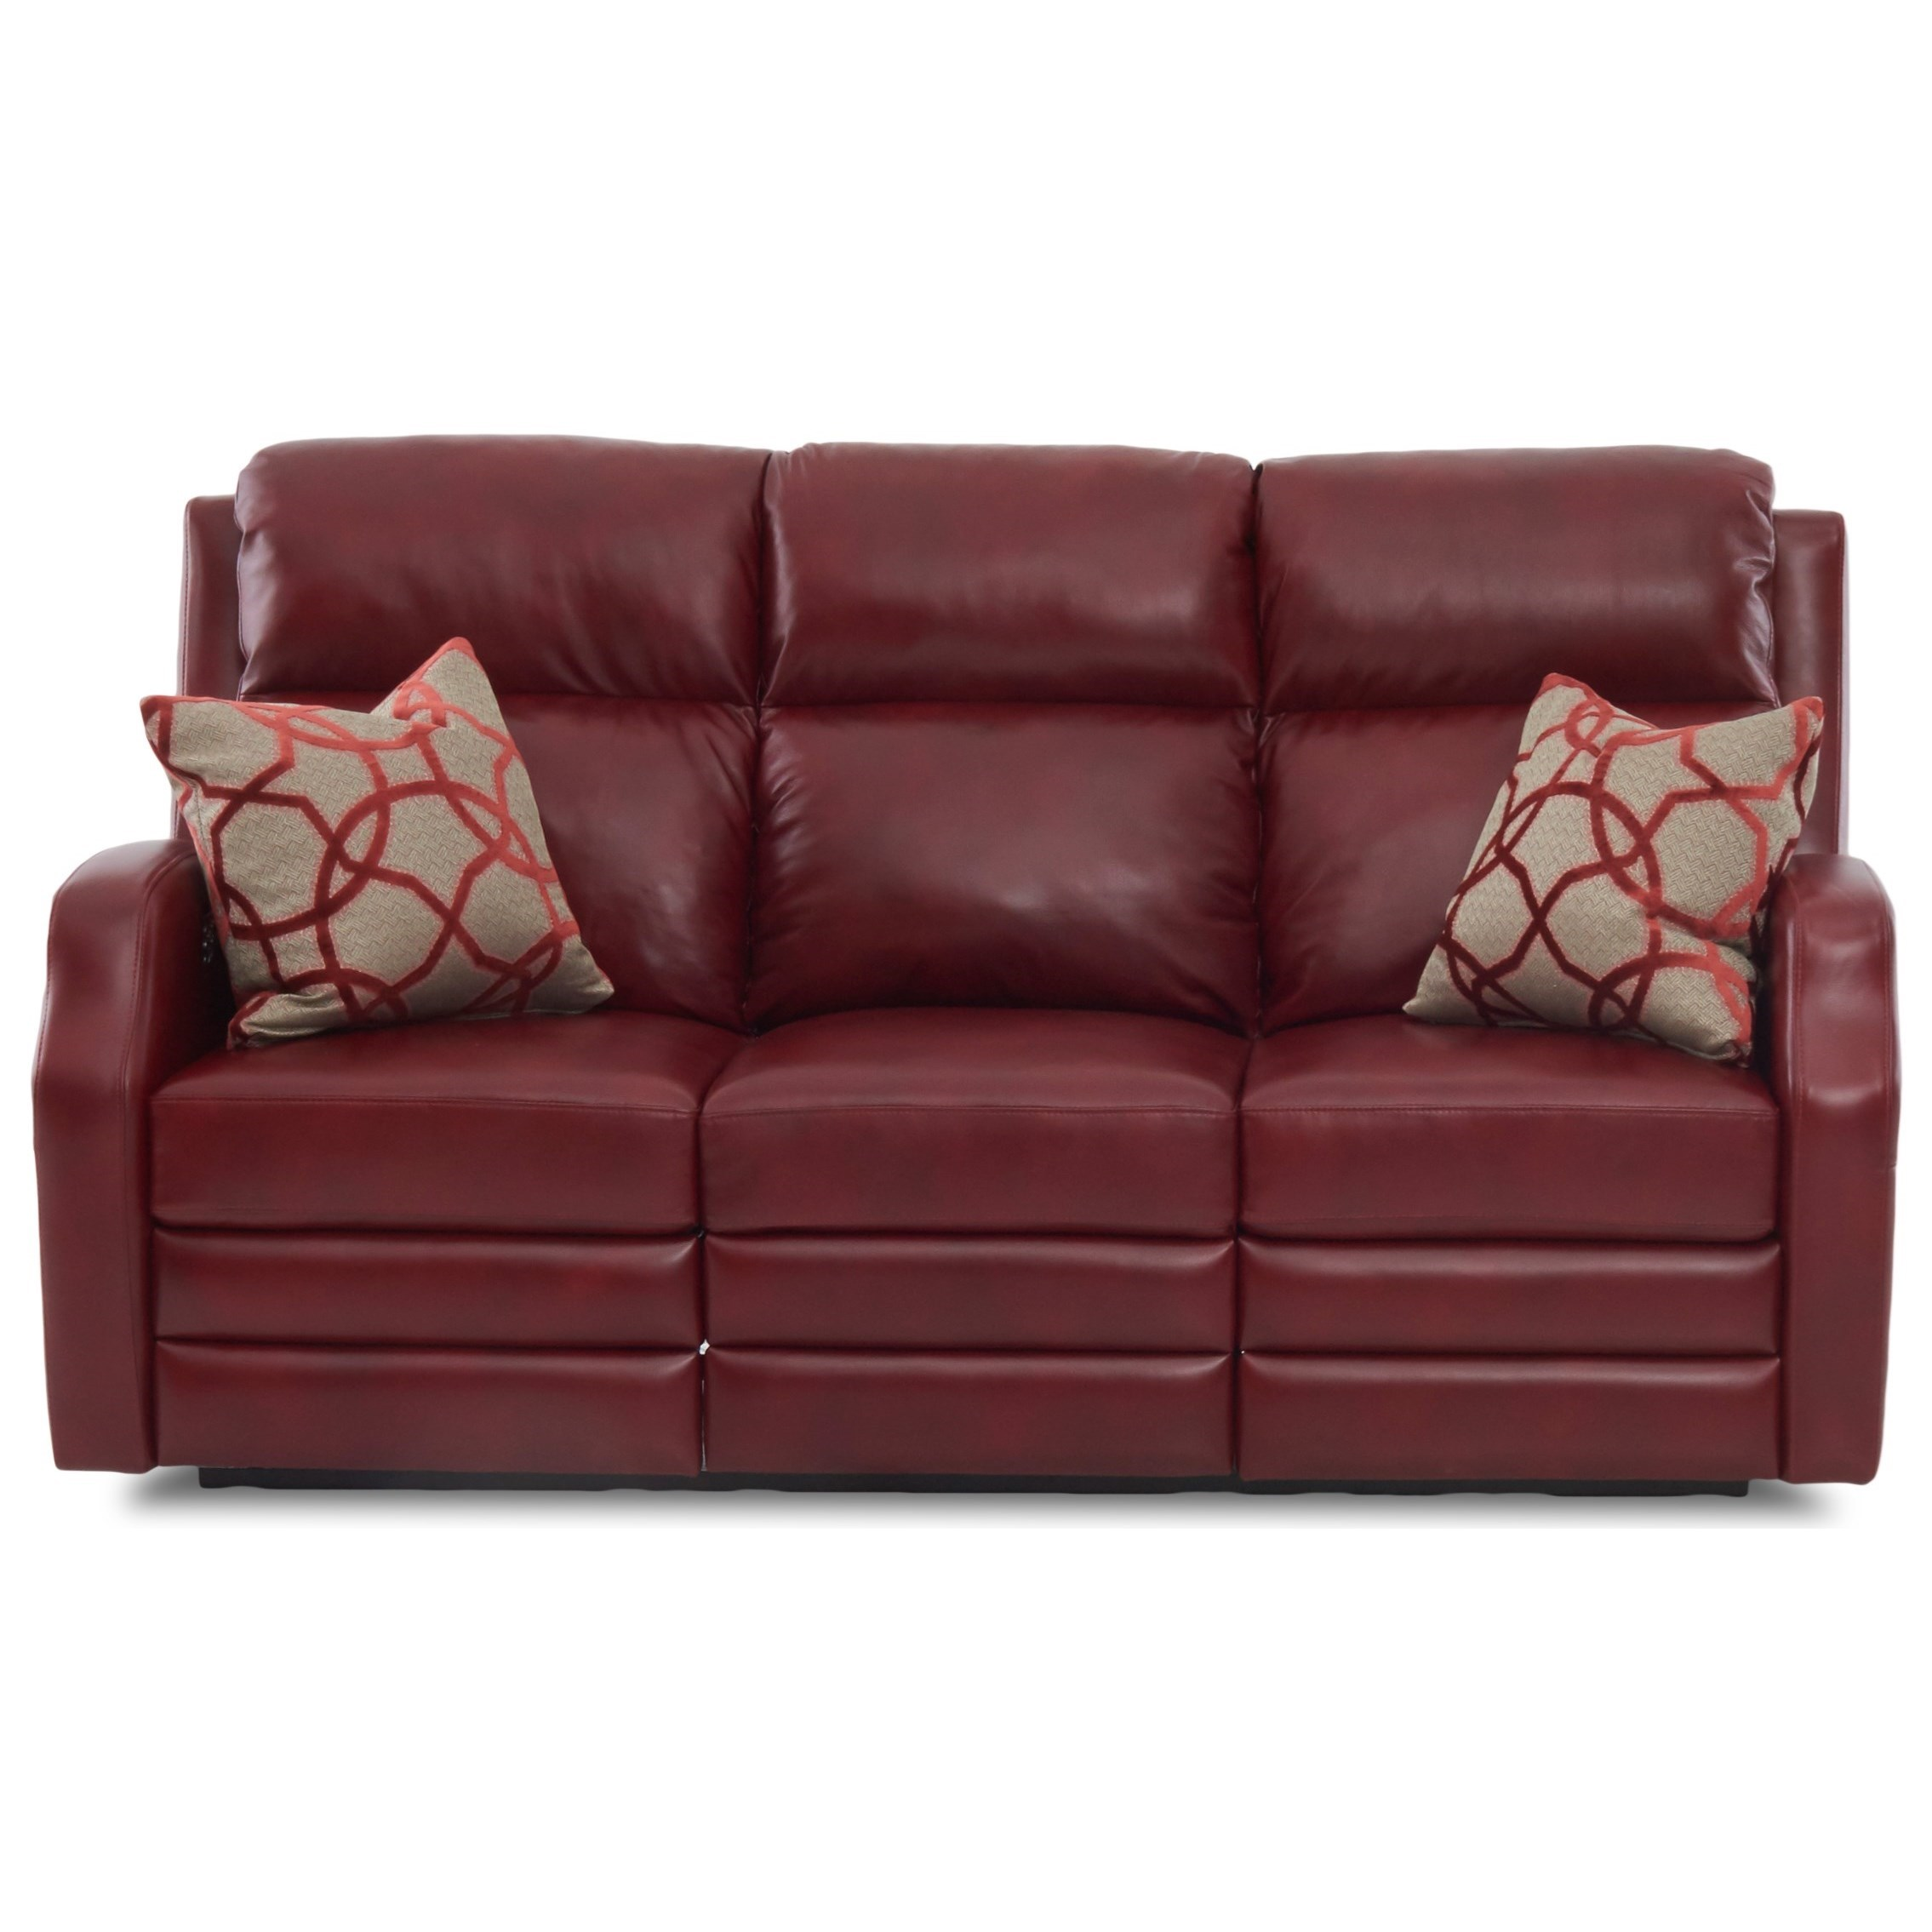 Pwr Reclining Sofa w/ Pillows & Pwr Head/Lum